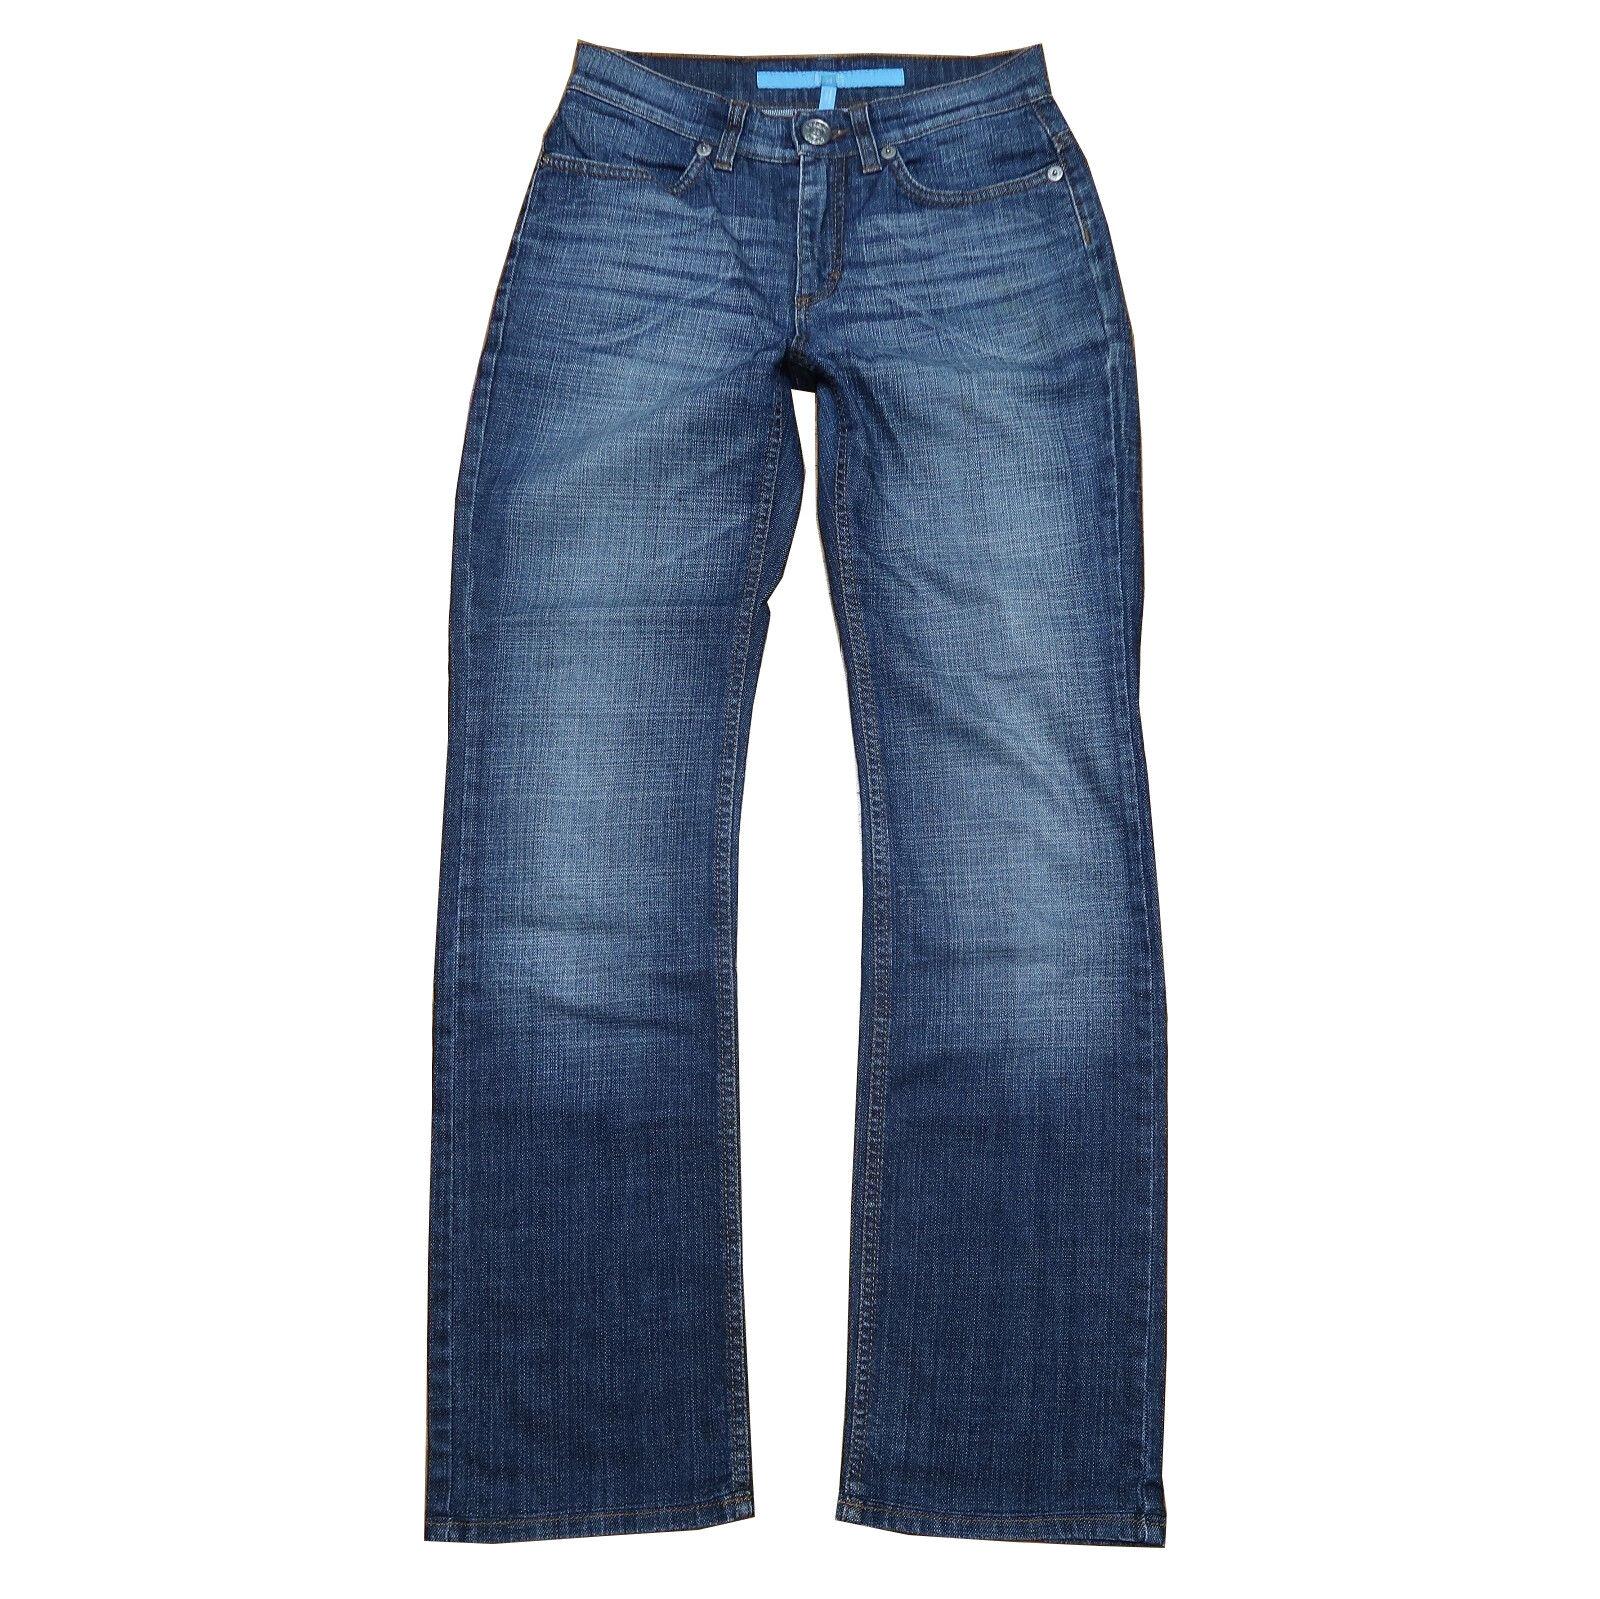 Esa Sport jeans-Linda-T 34 environ w25 l30-Hüftjeans aspect Use Mid Waist